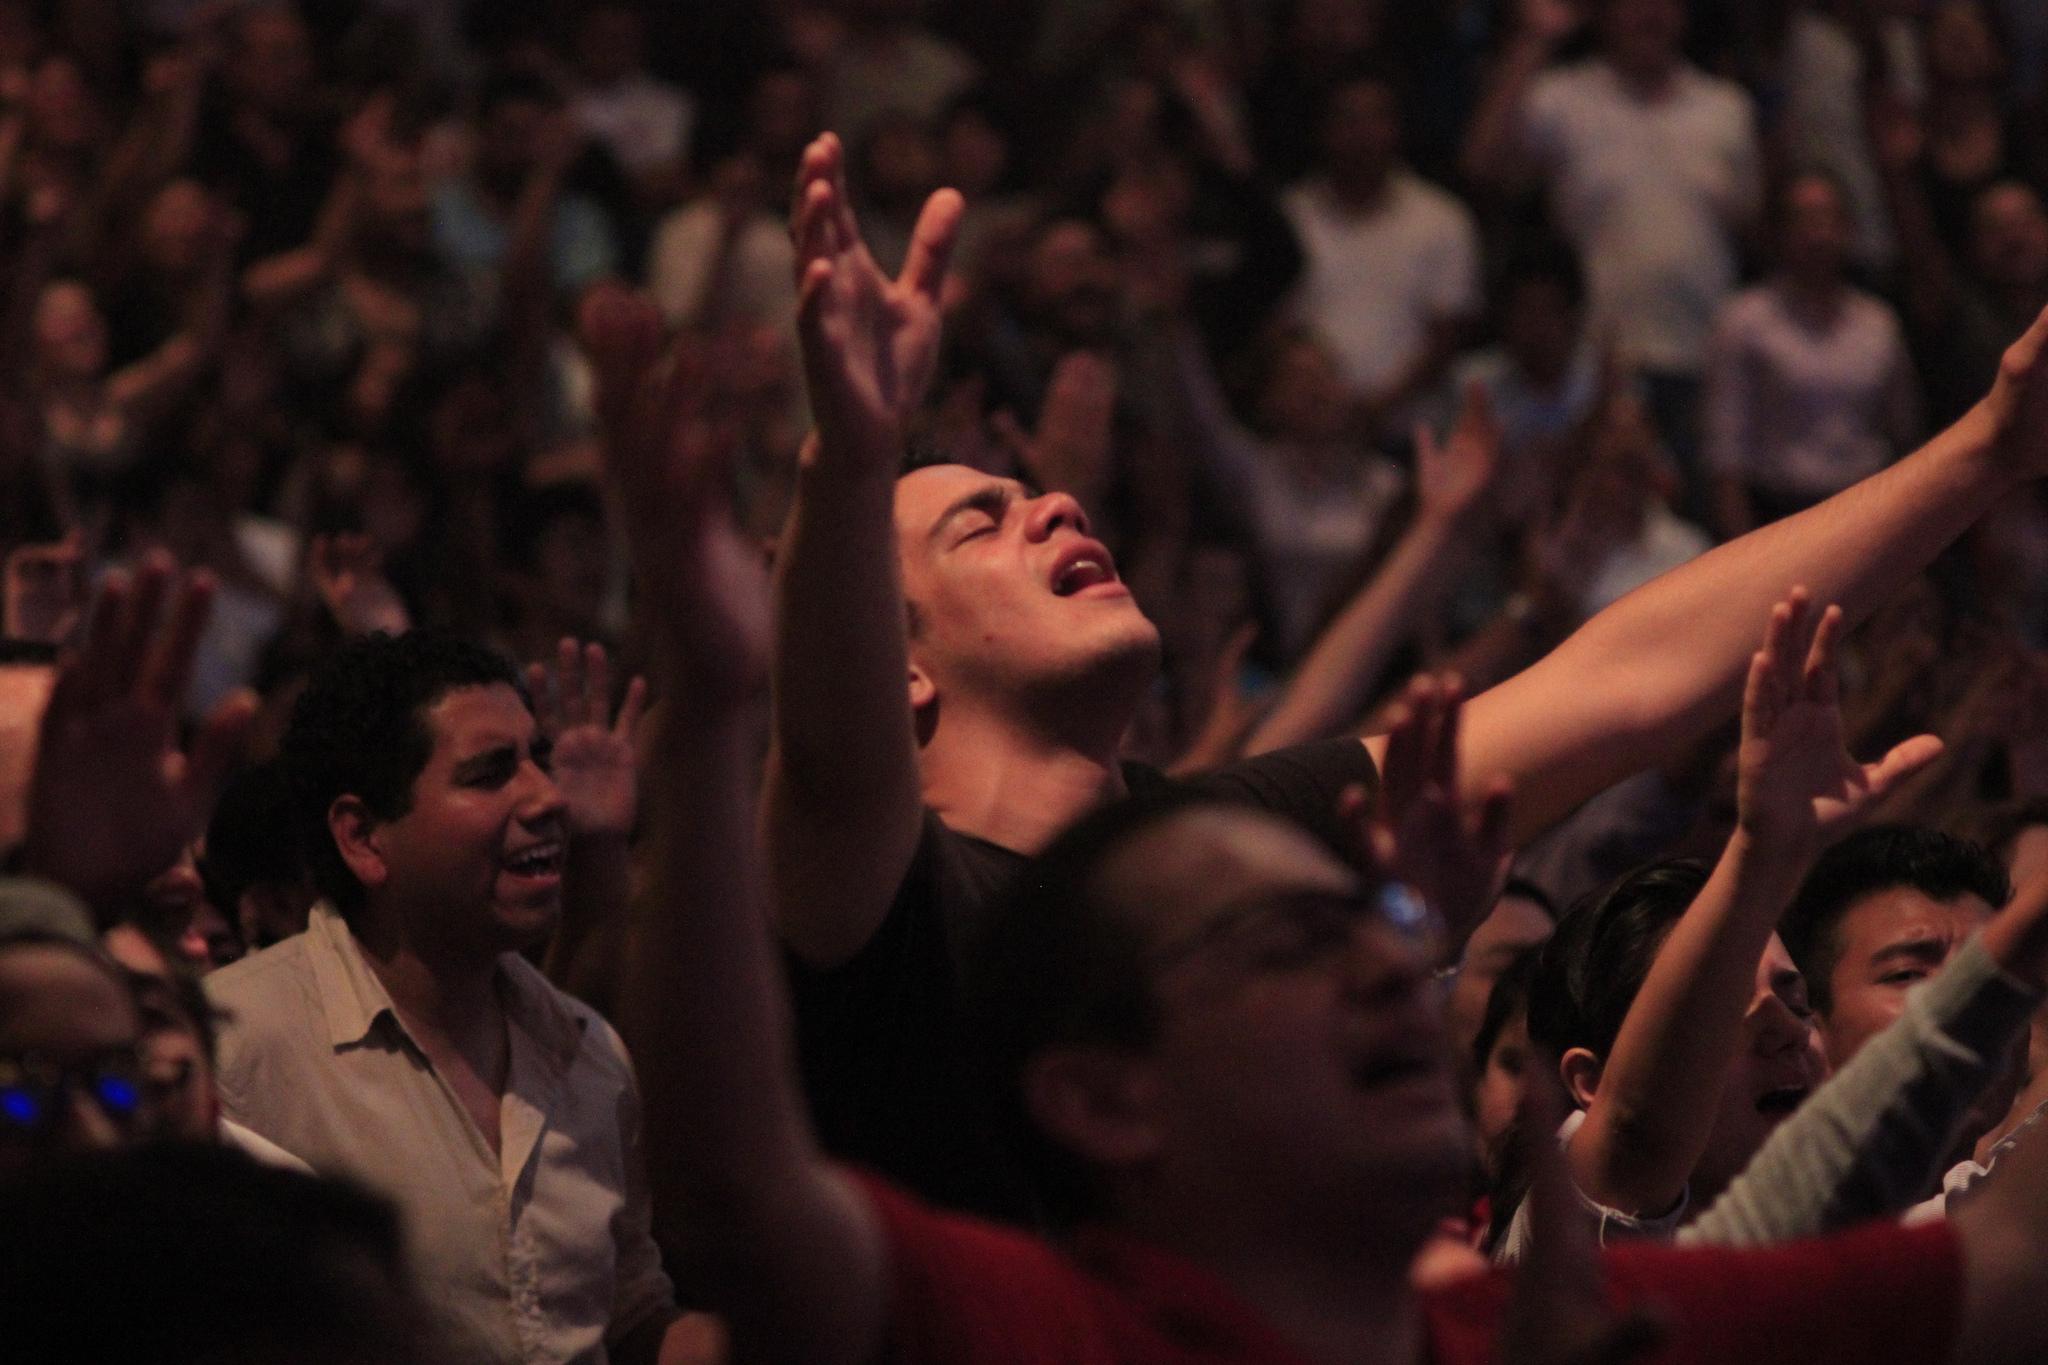 Church Faith Meets World